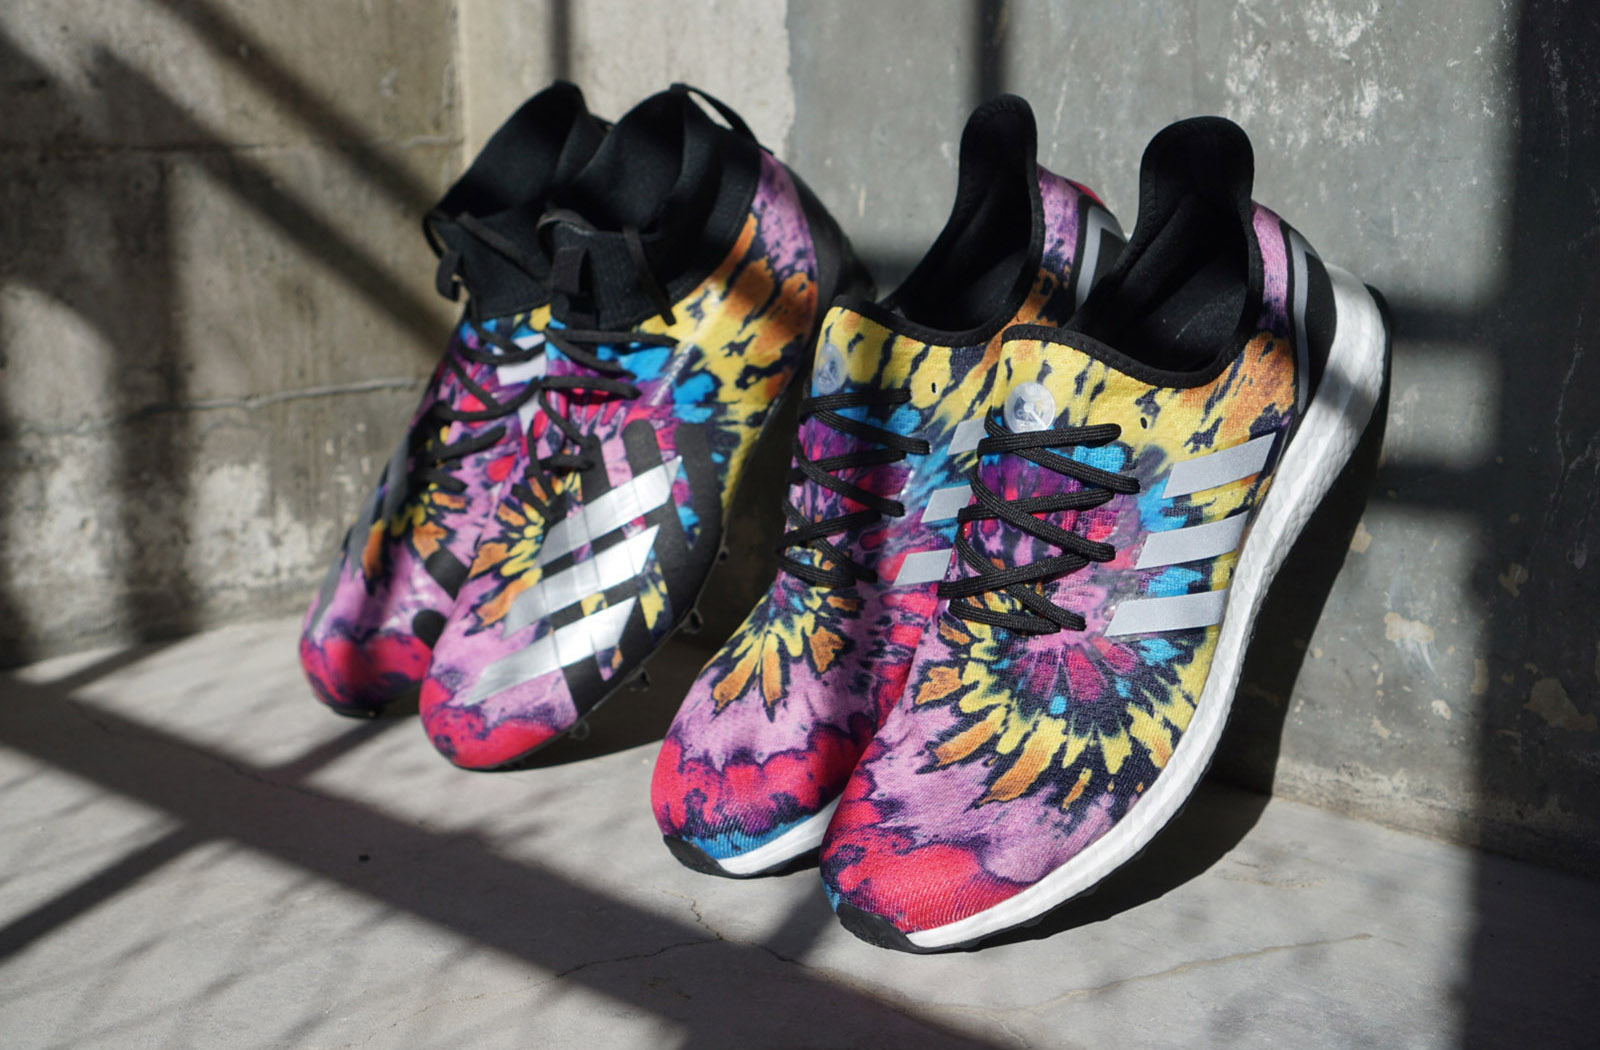 2019 adidas x FootLocker SPEEDFACTORY AM4TL Shoes   Cleats 01.jpg 7b74ae312